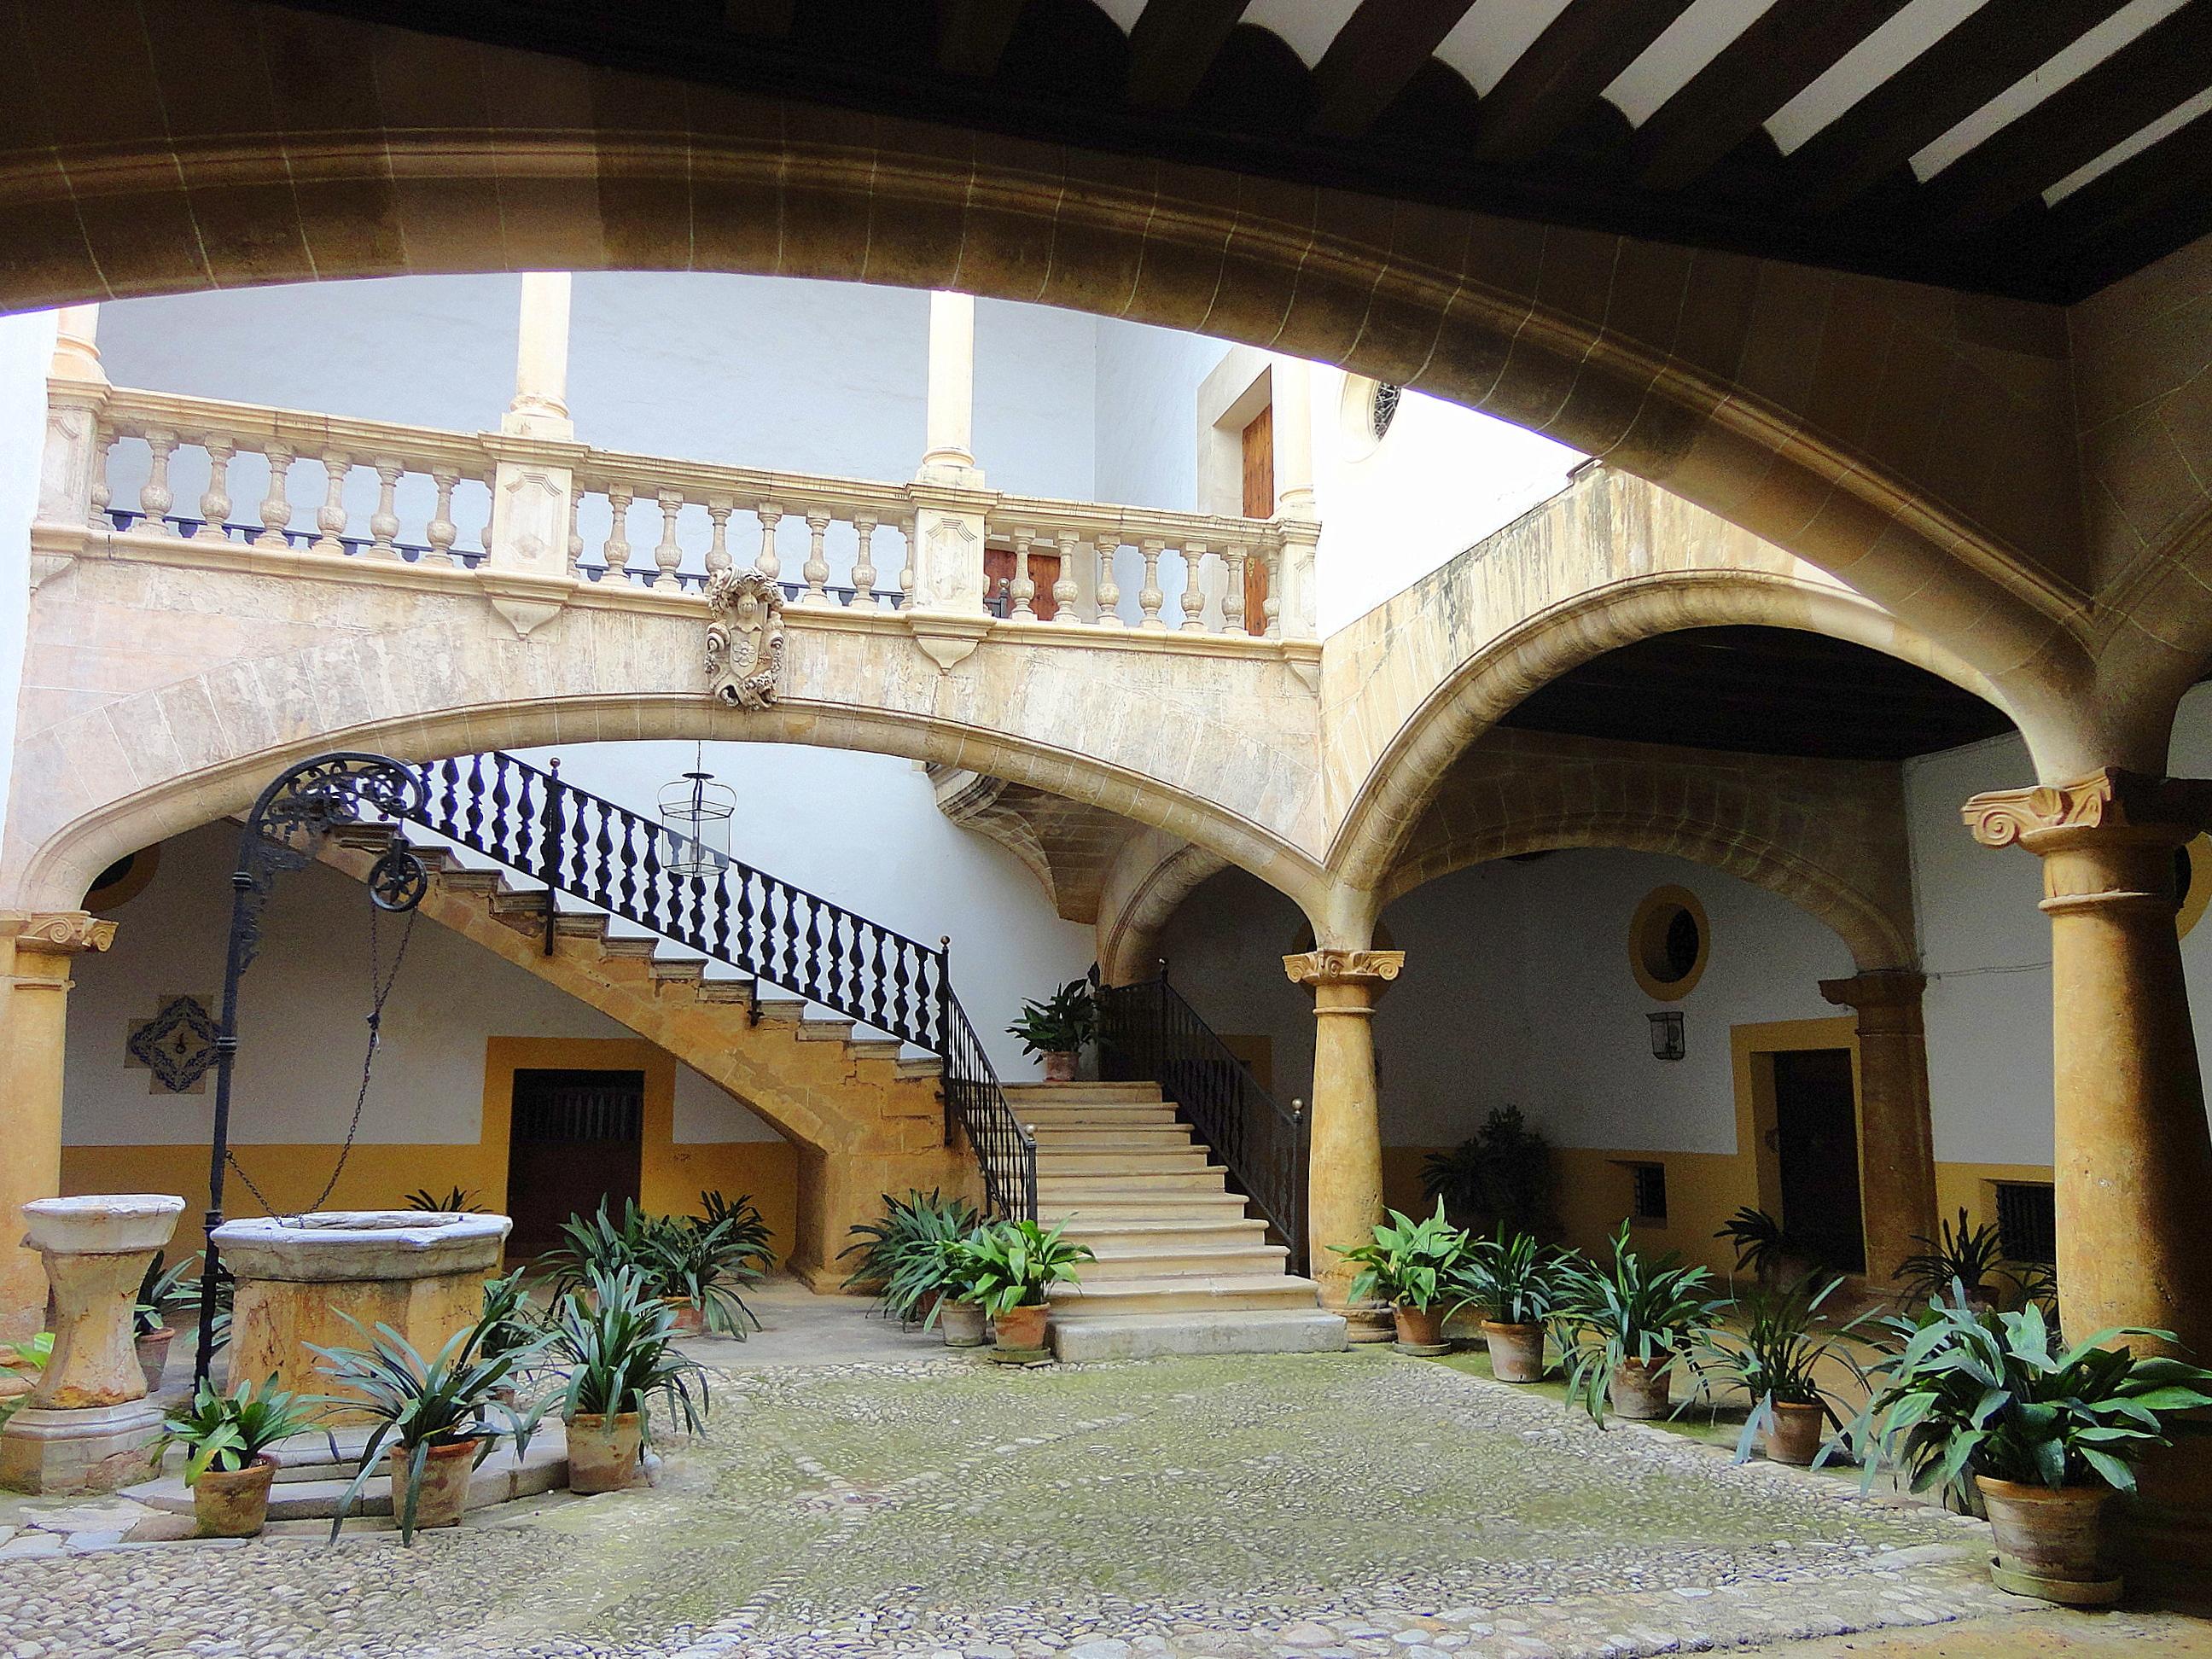 El patio mallorqu n ejemplo perfecto de arquitectura - Arquitectura bioclimatica ejemplos ...